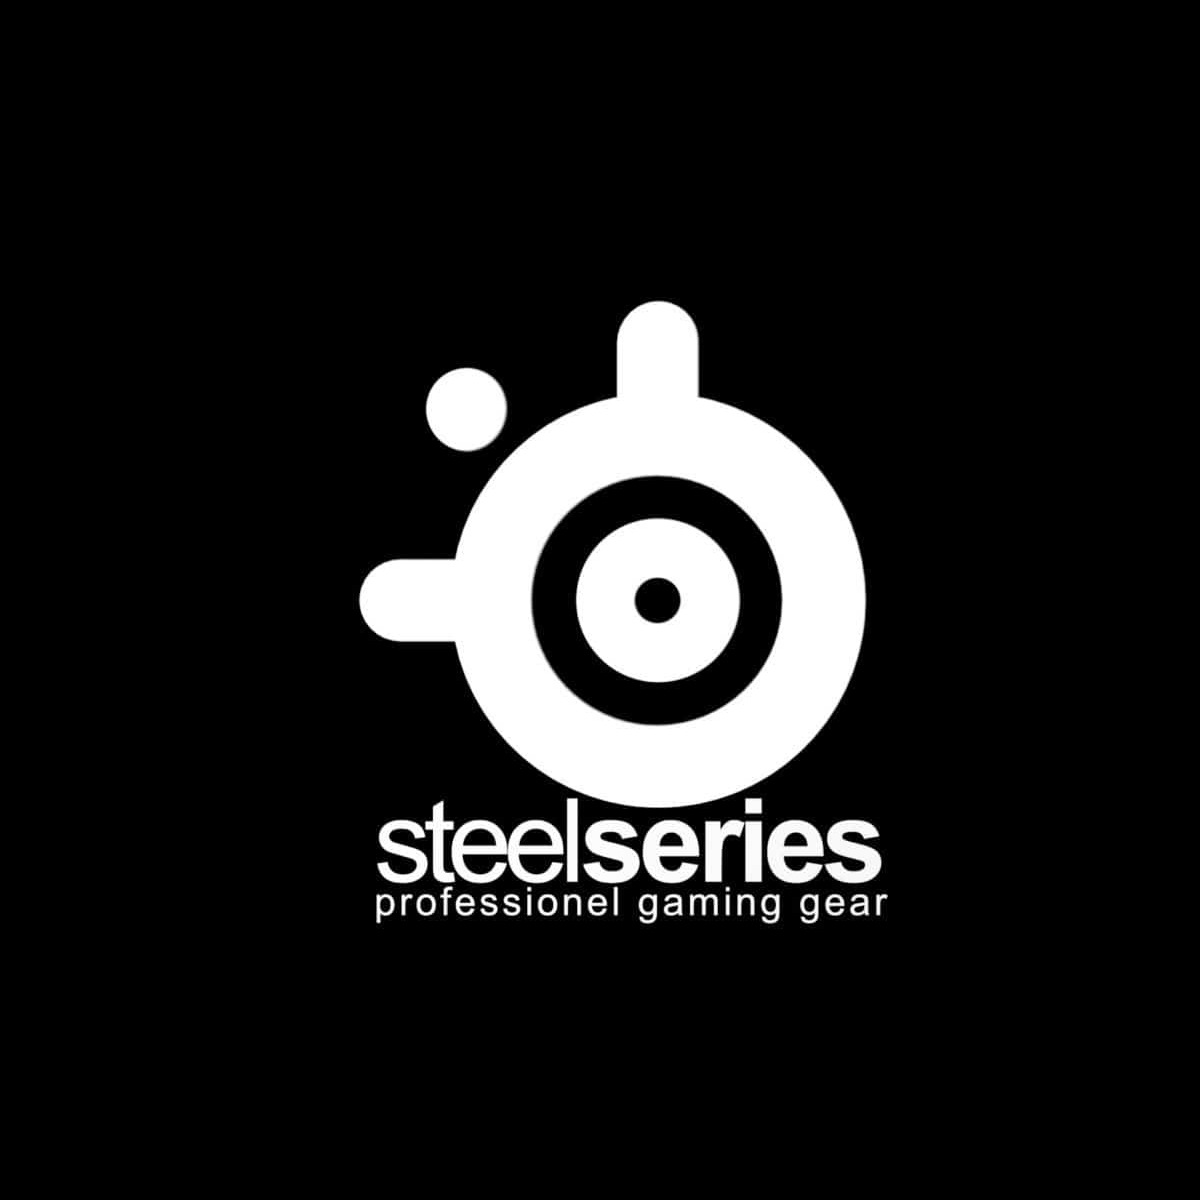 steelseries-white0157.jpg